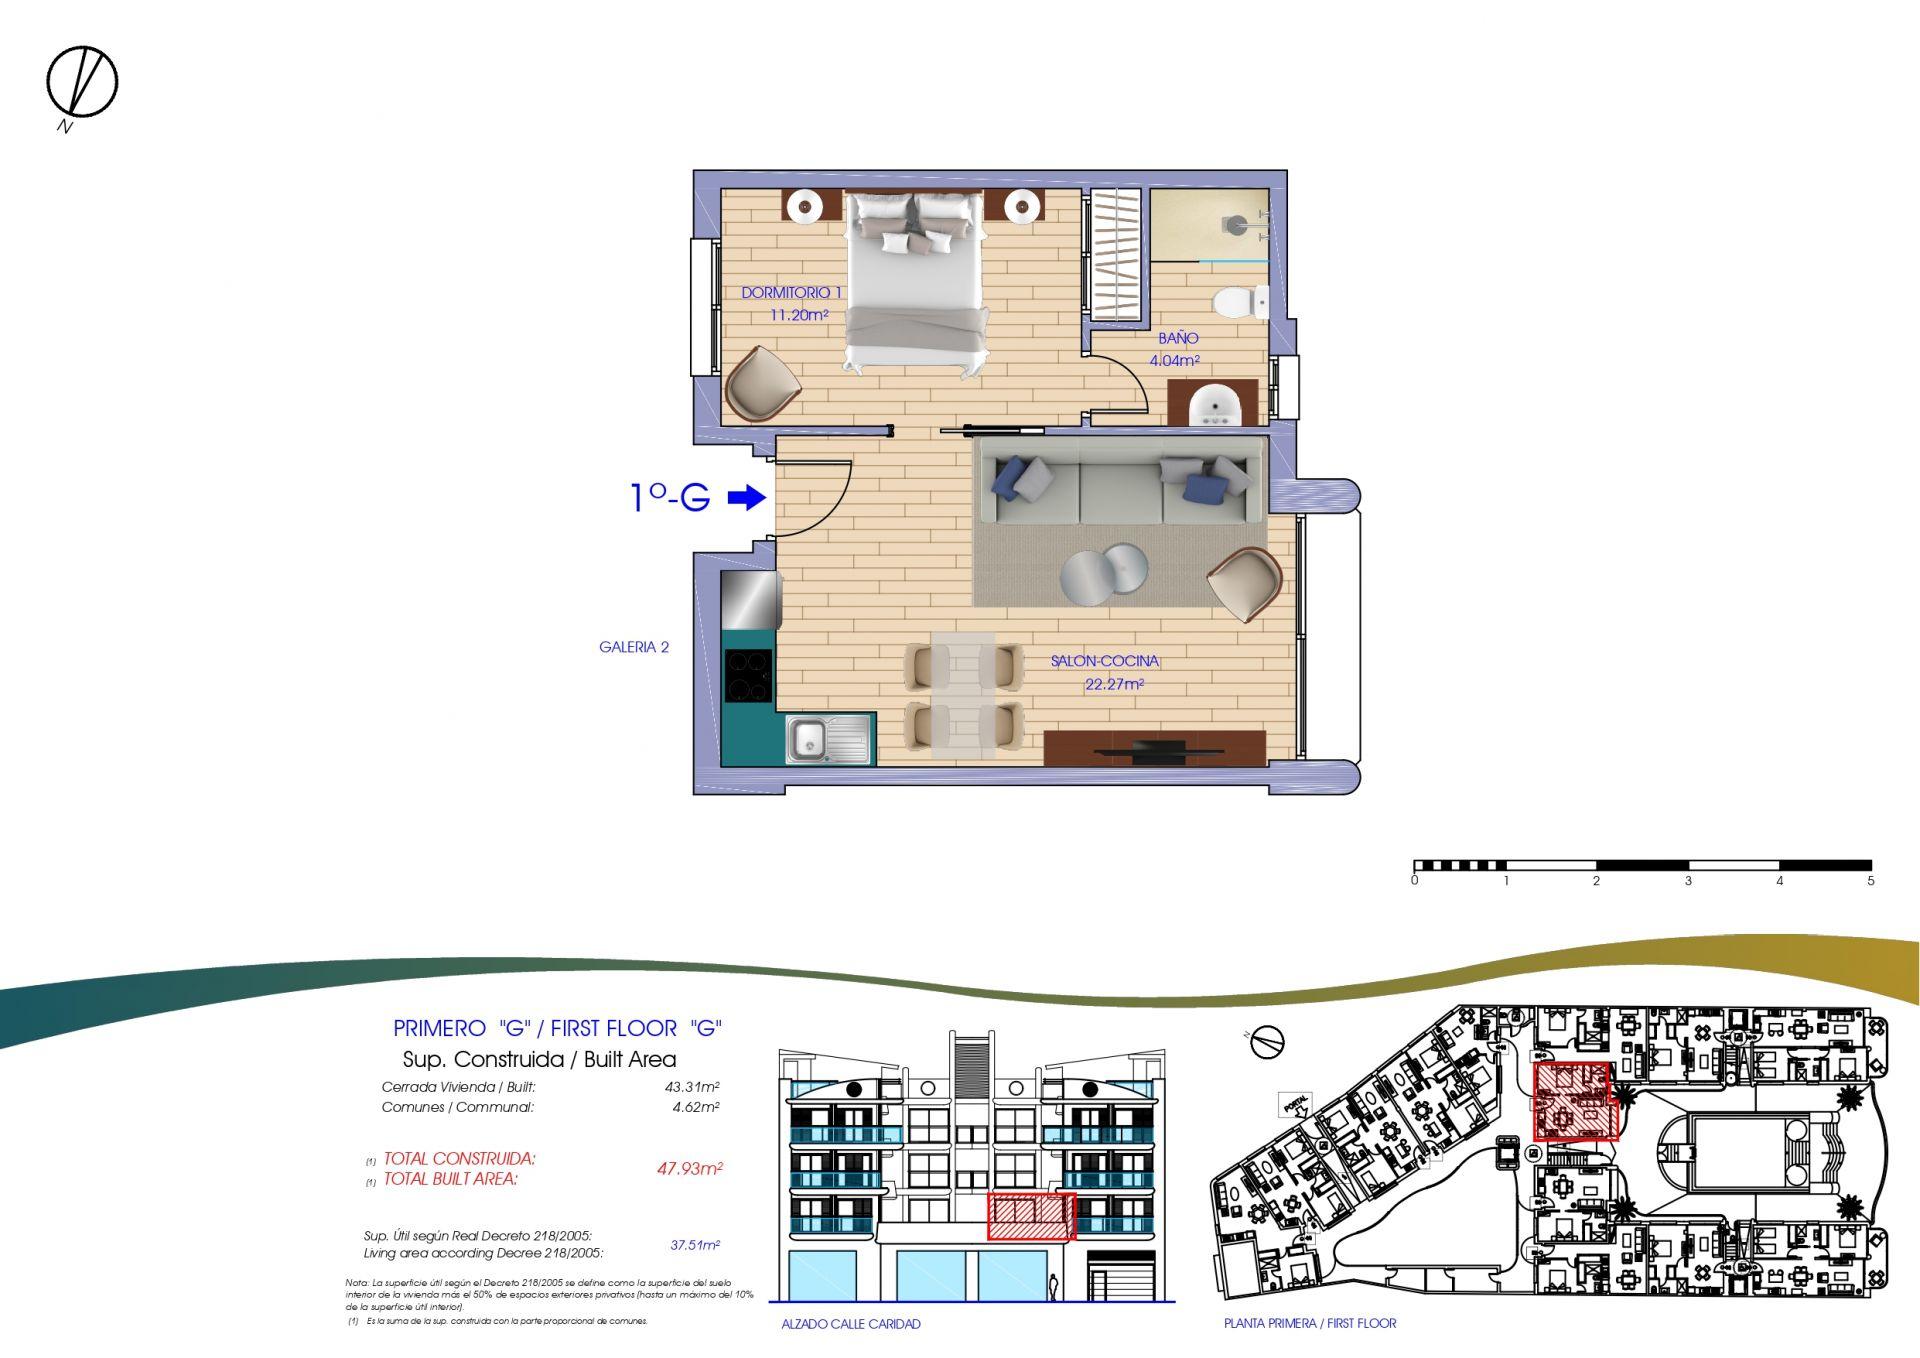 1g - Ventura Estepona | Compra de casa en Estepona